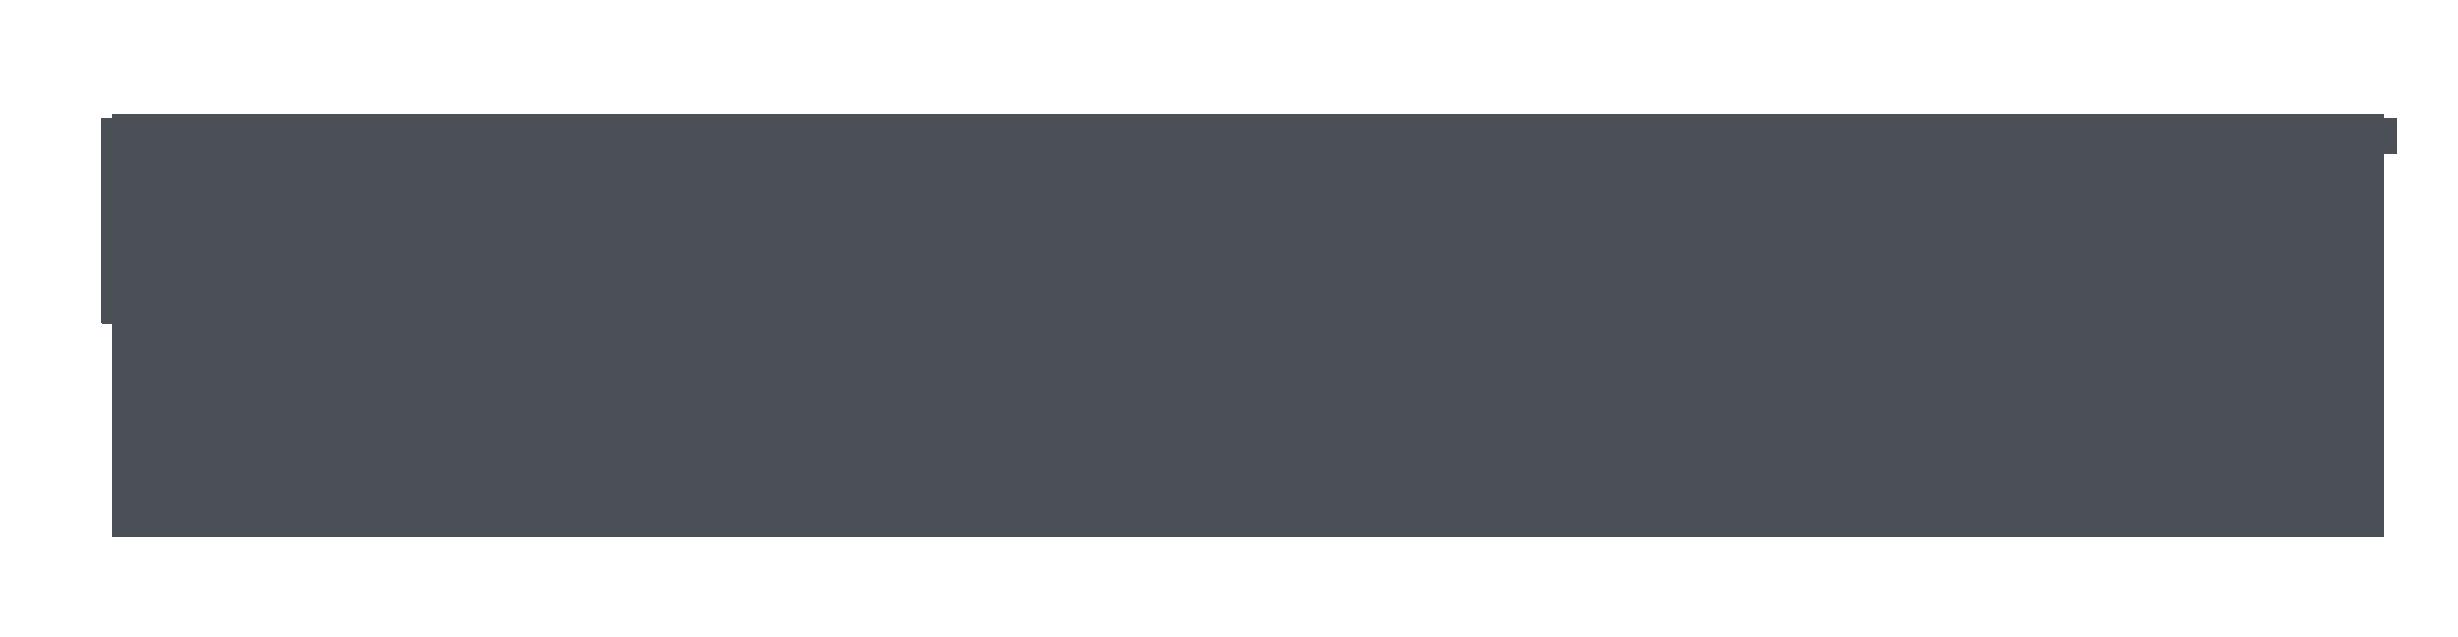 Larchmont Studios